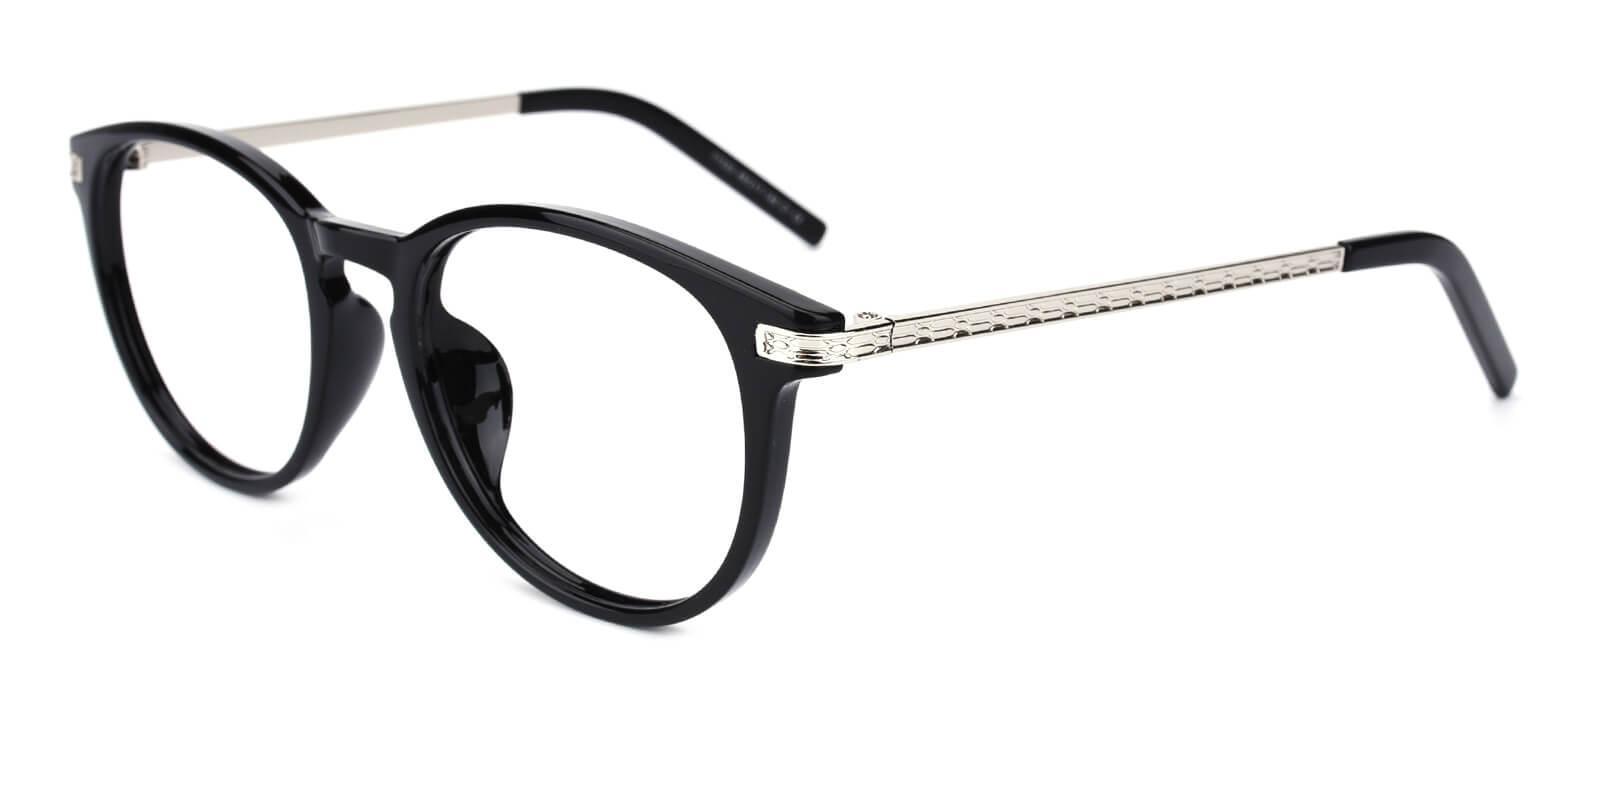 Gambia-Black-Round-Combination-Eyeglasses-additional1